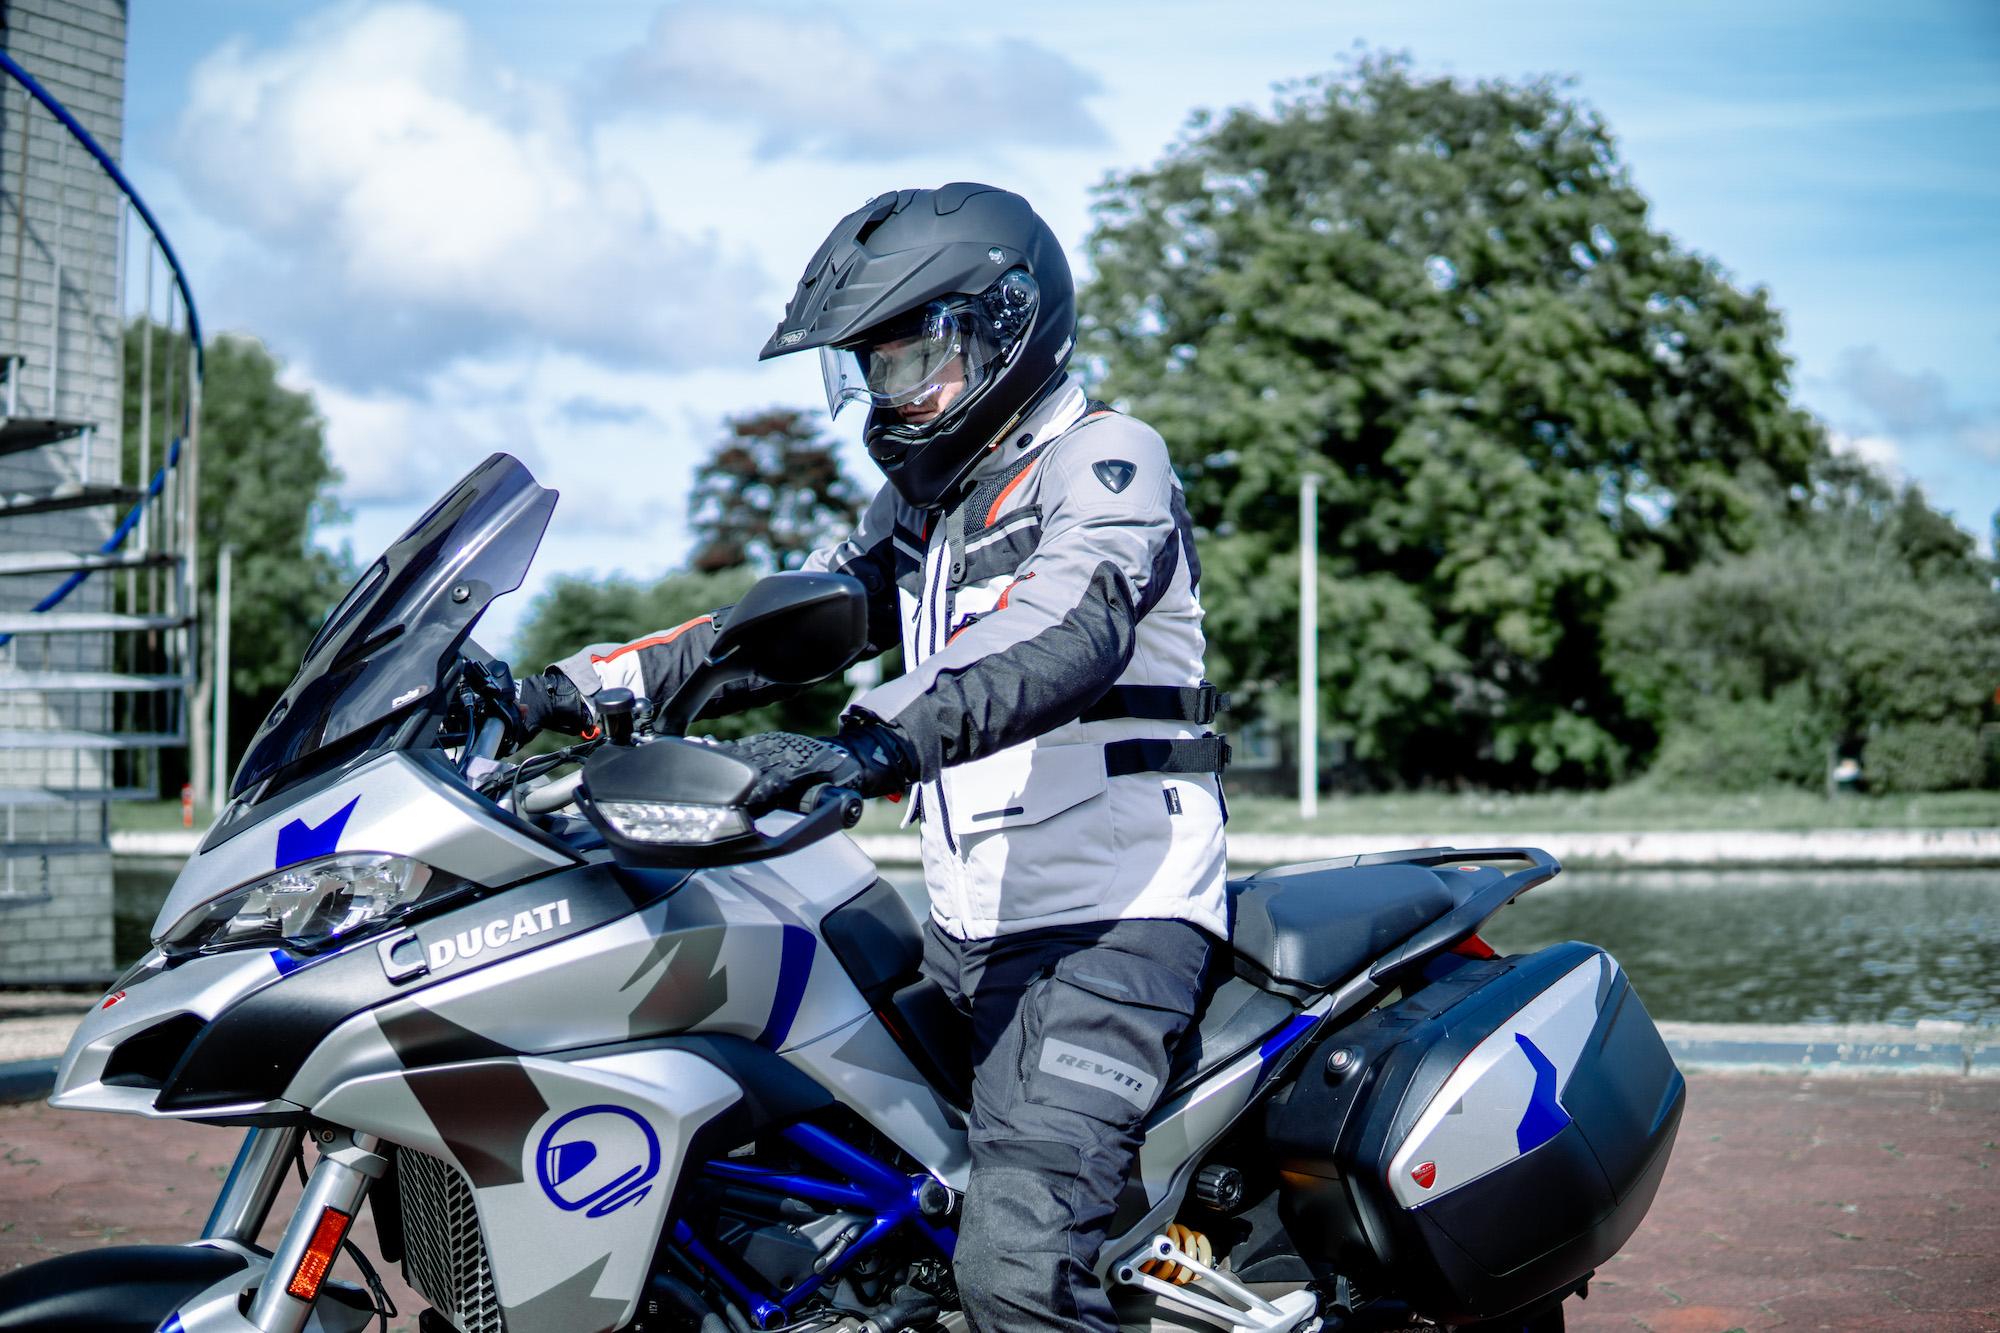 REV'IT! Adventure outfit bij Motorkledingcenter